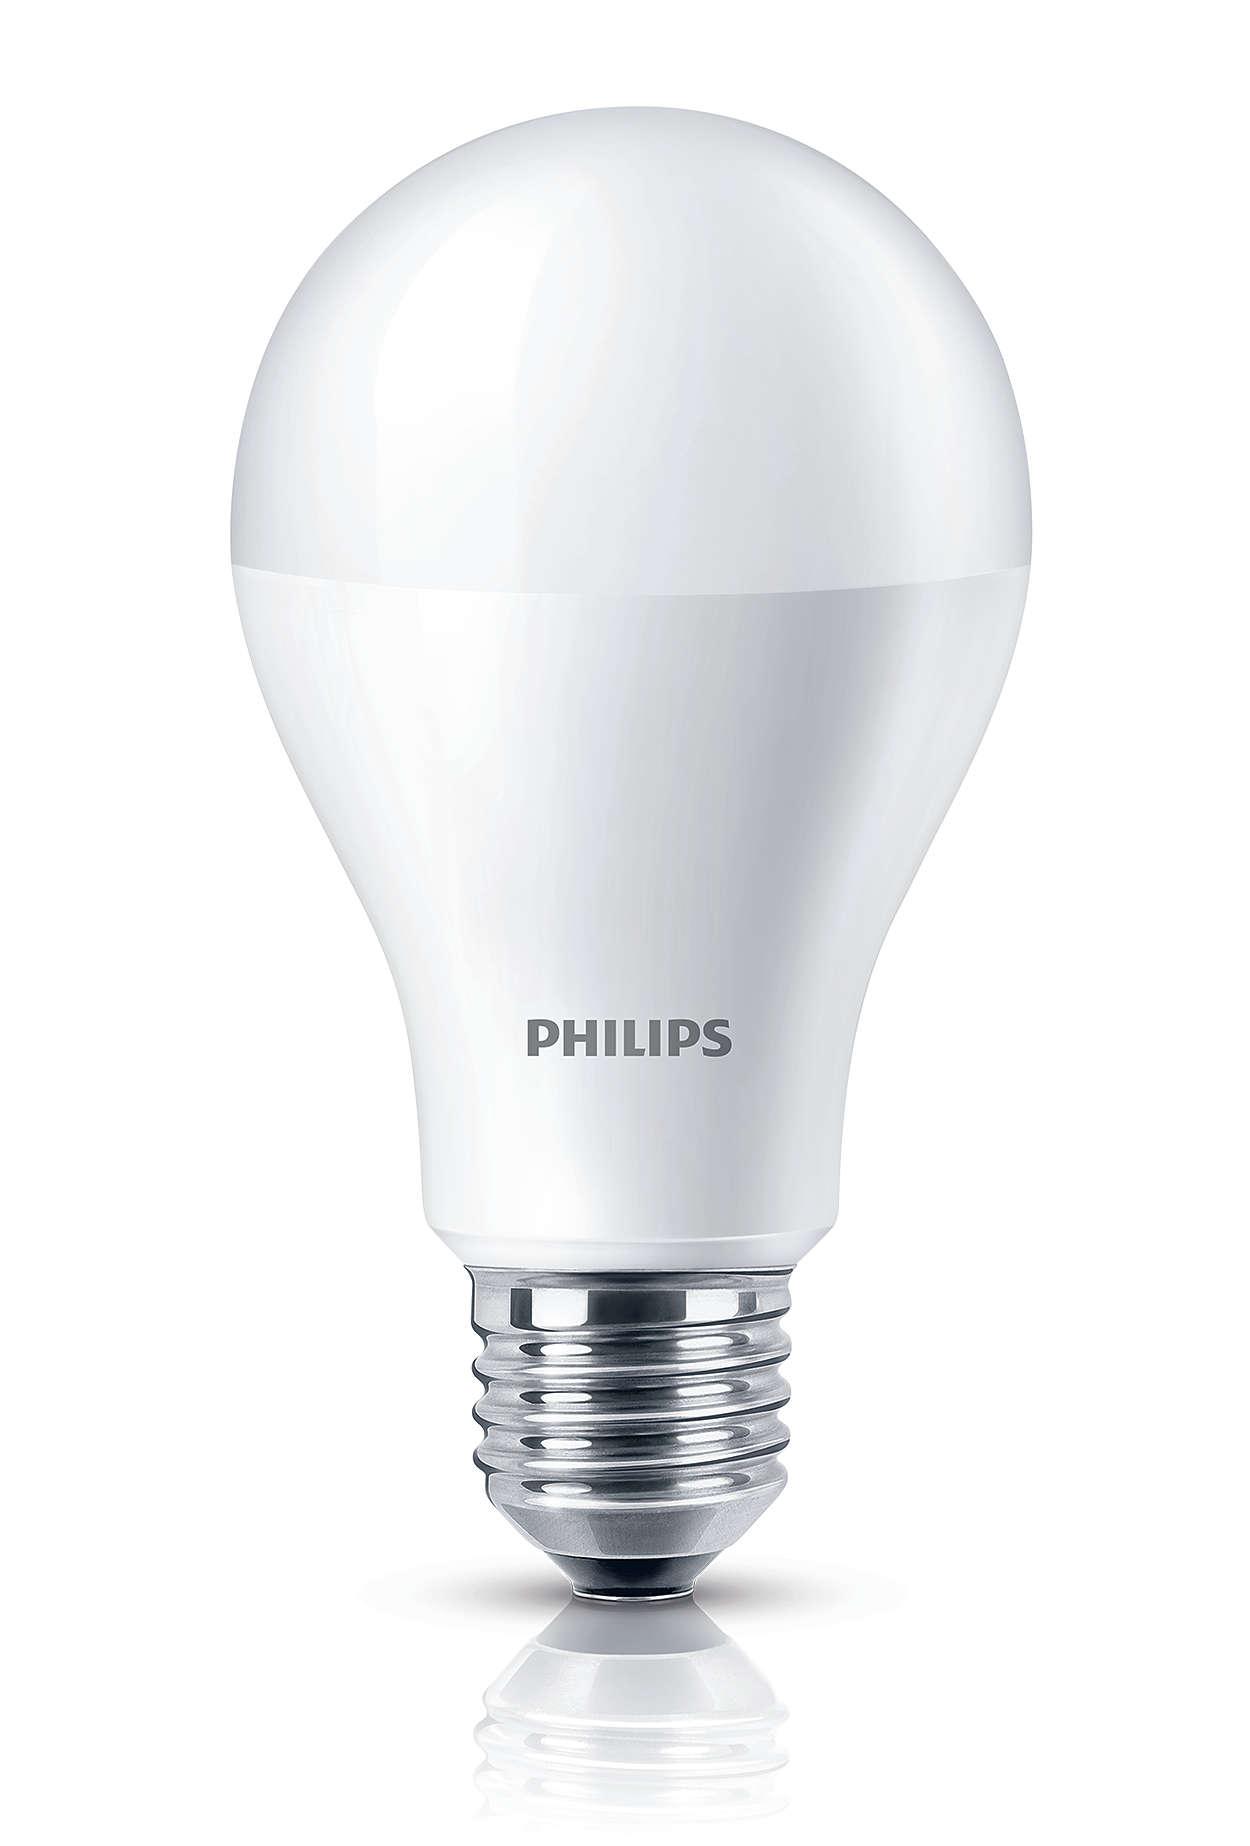 Luz LED branca agradável